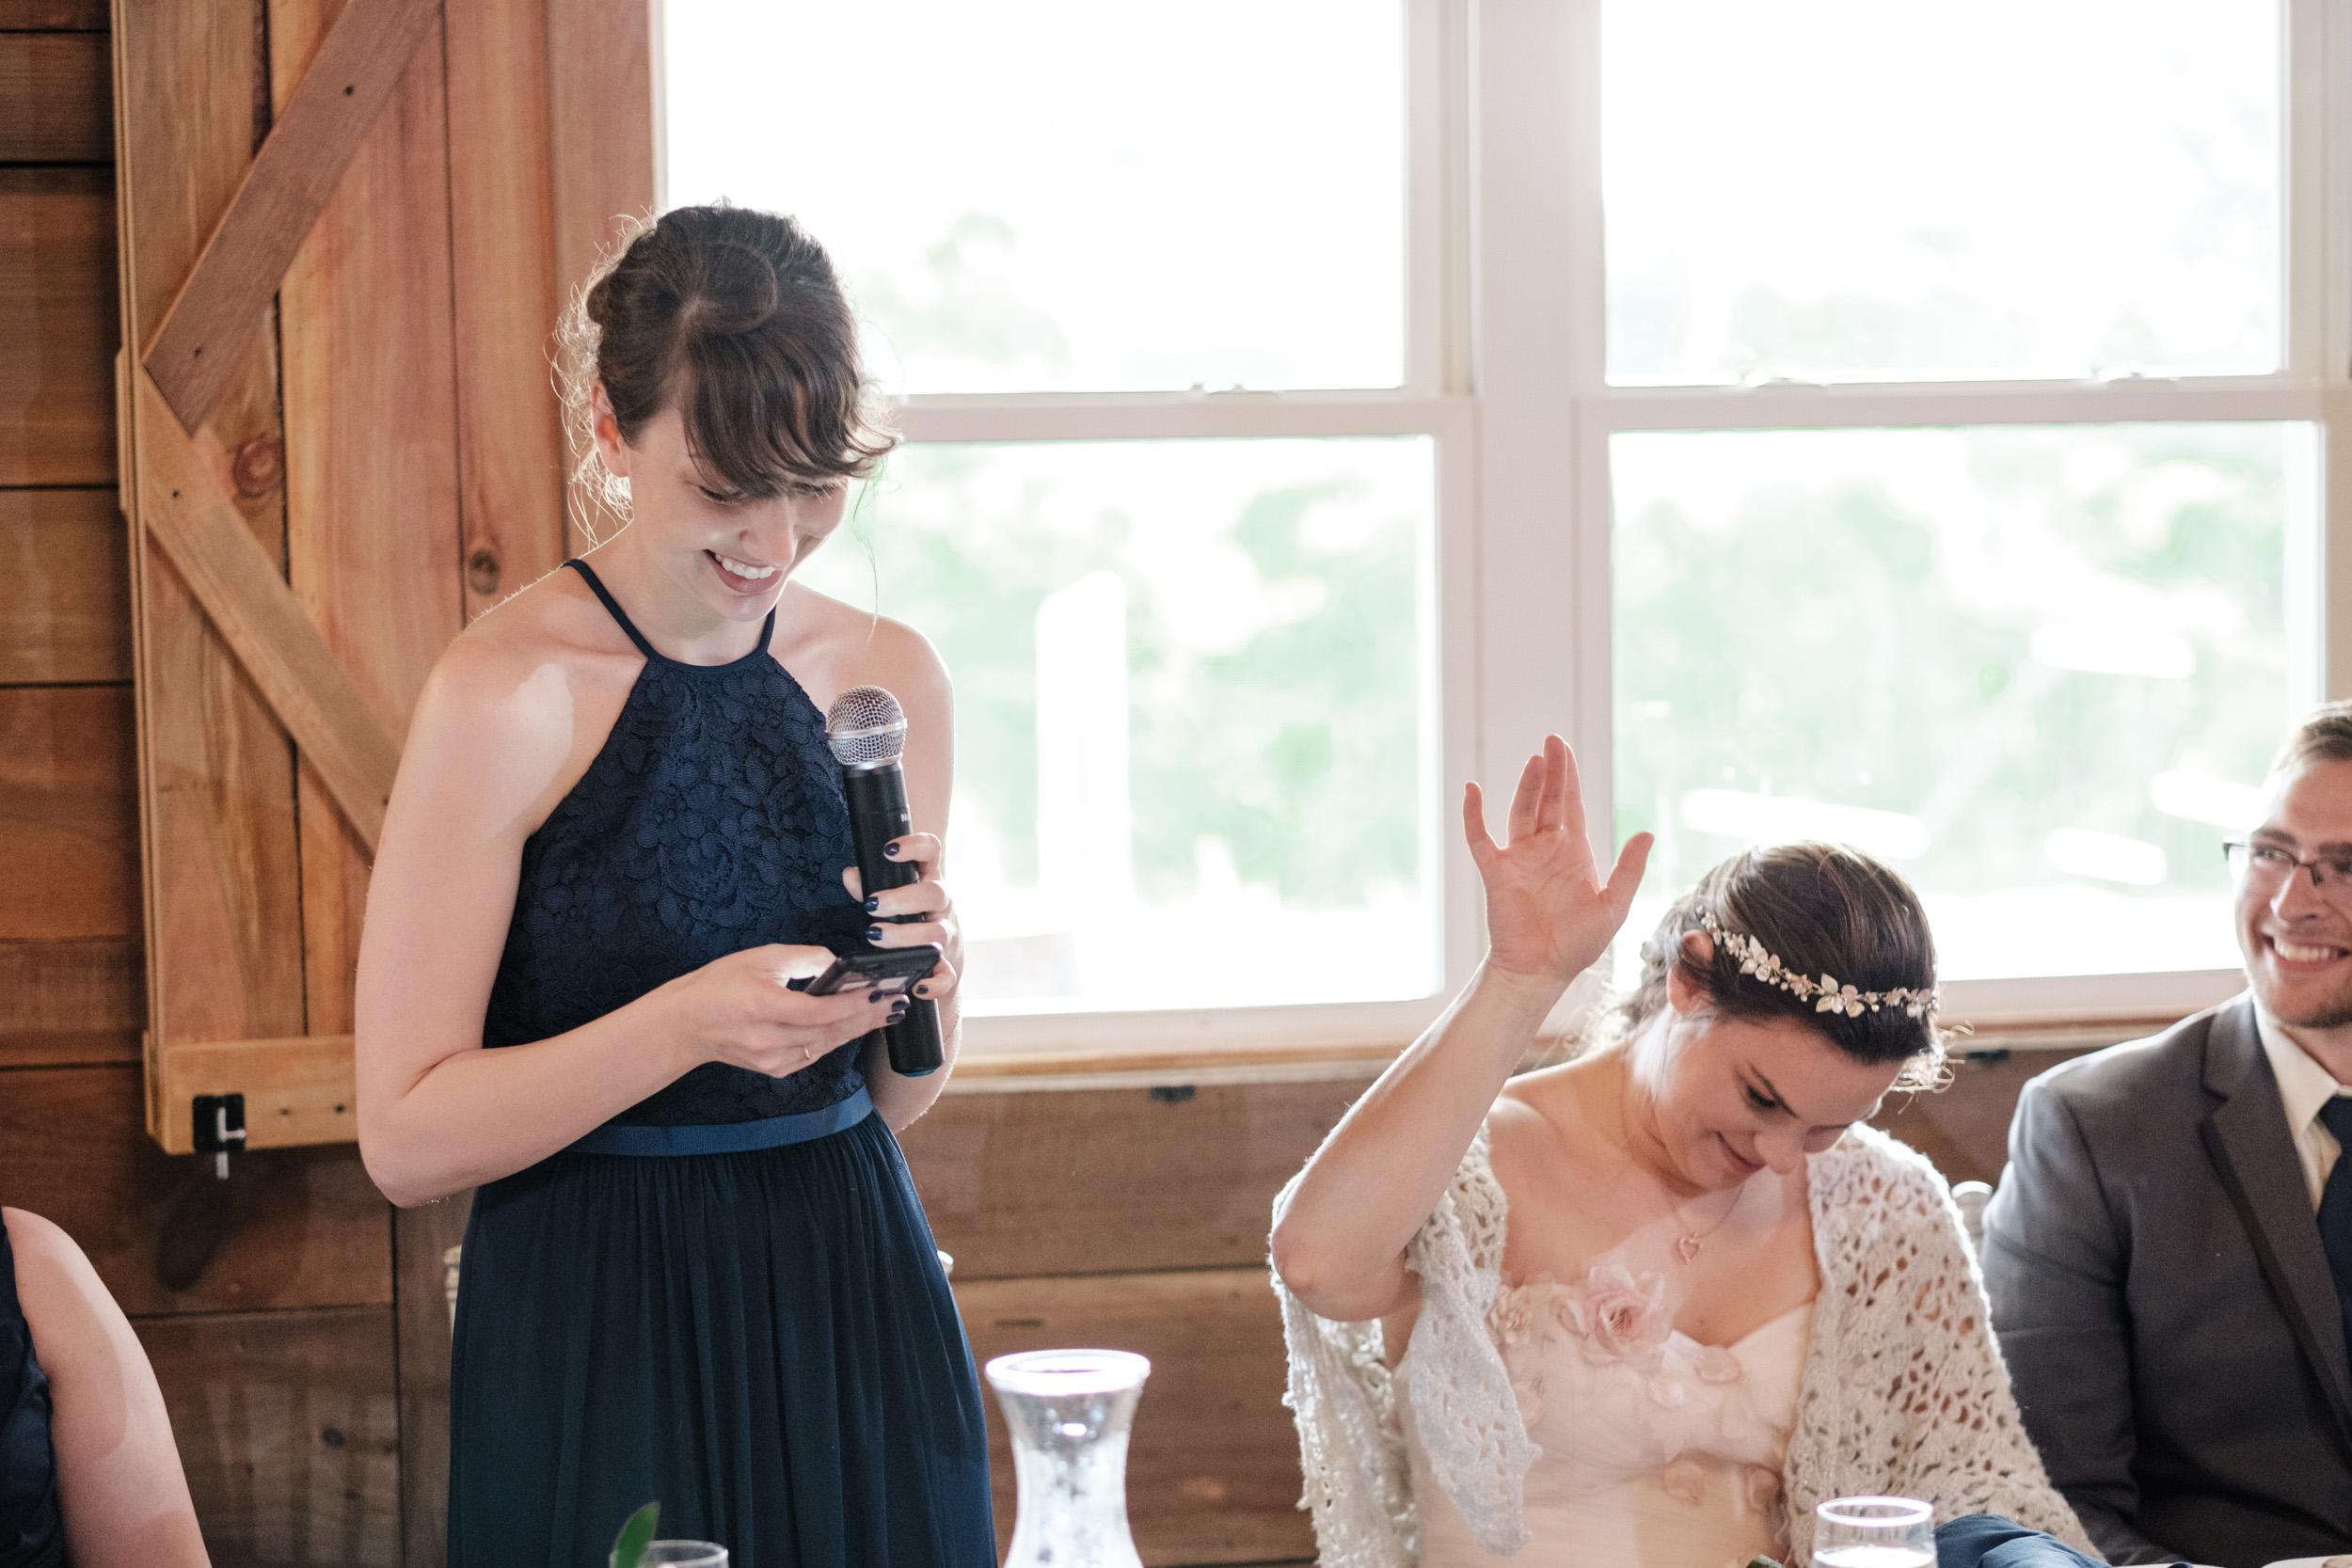 19-06-22-Ryan-Katie-The-Fields-Reserve-Wedding-59.jpg